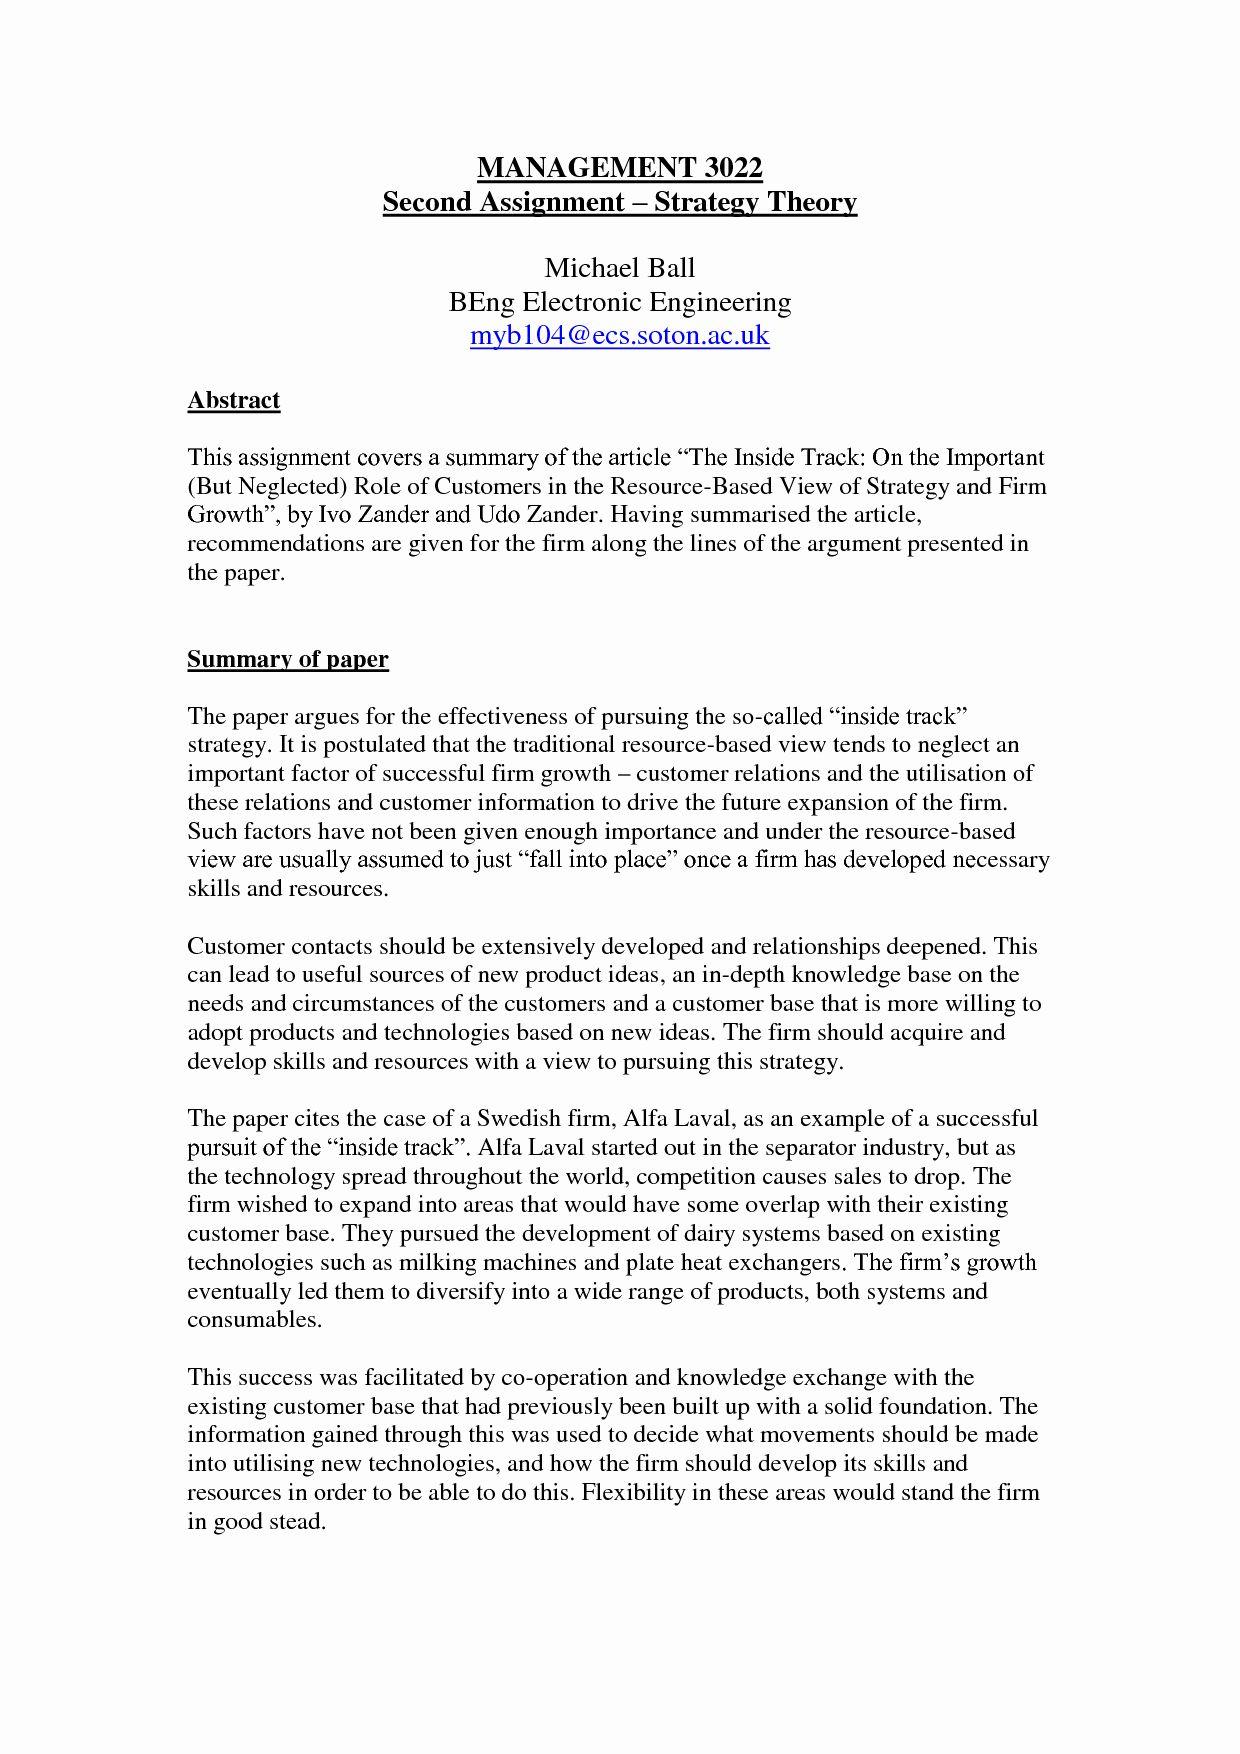 Ut Austin Letter Of Best Of 44 Example A